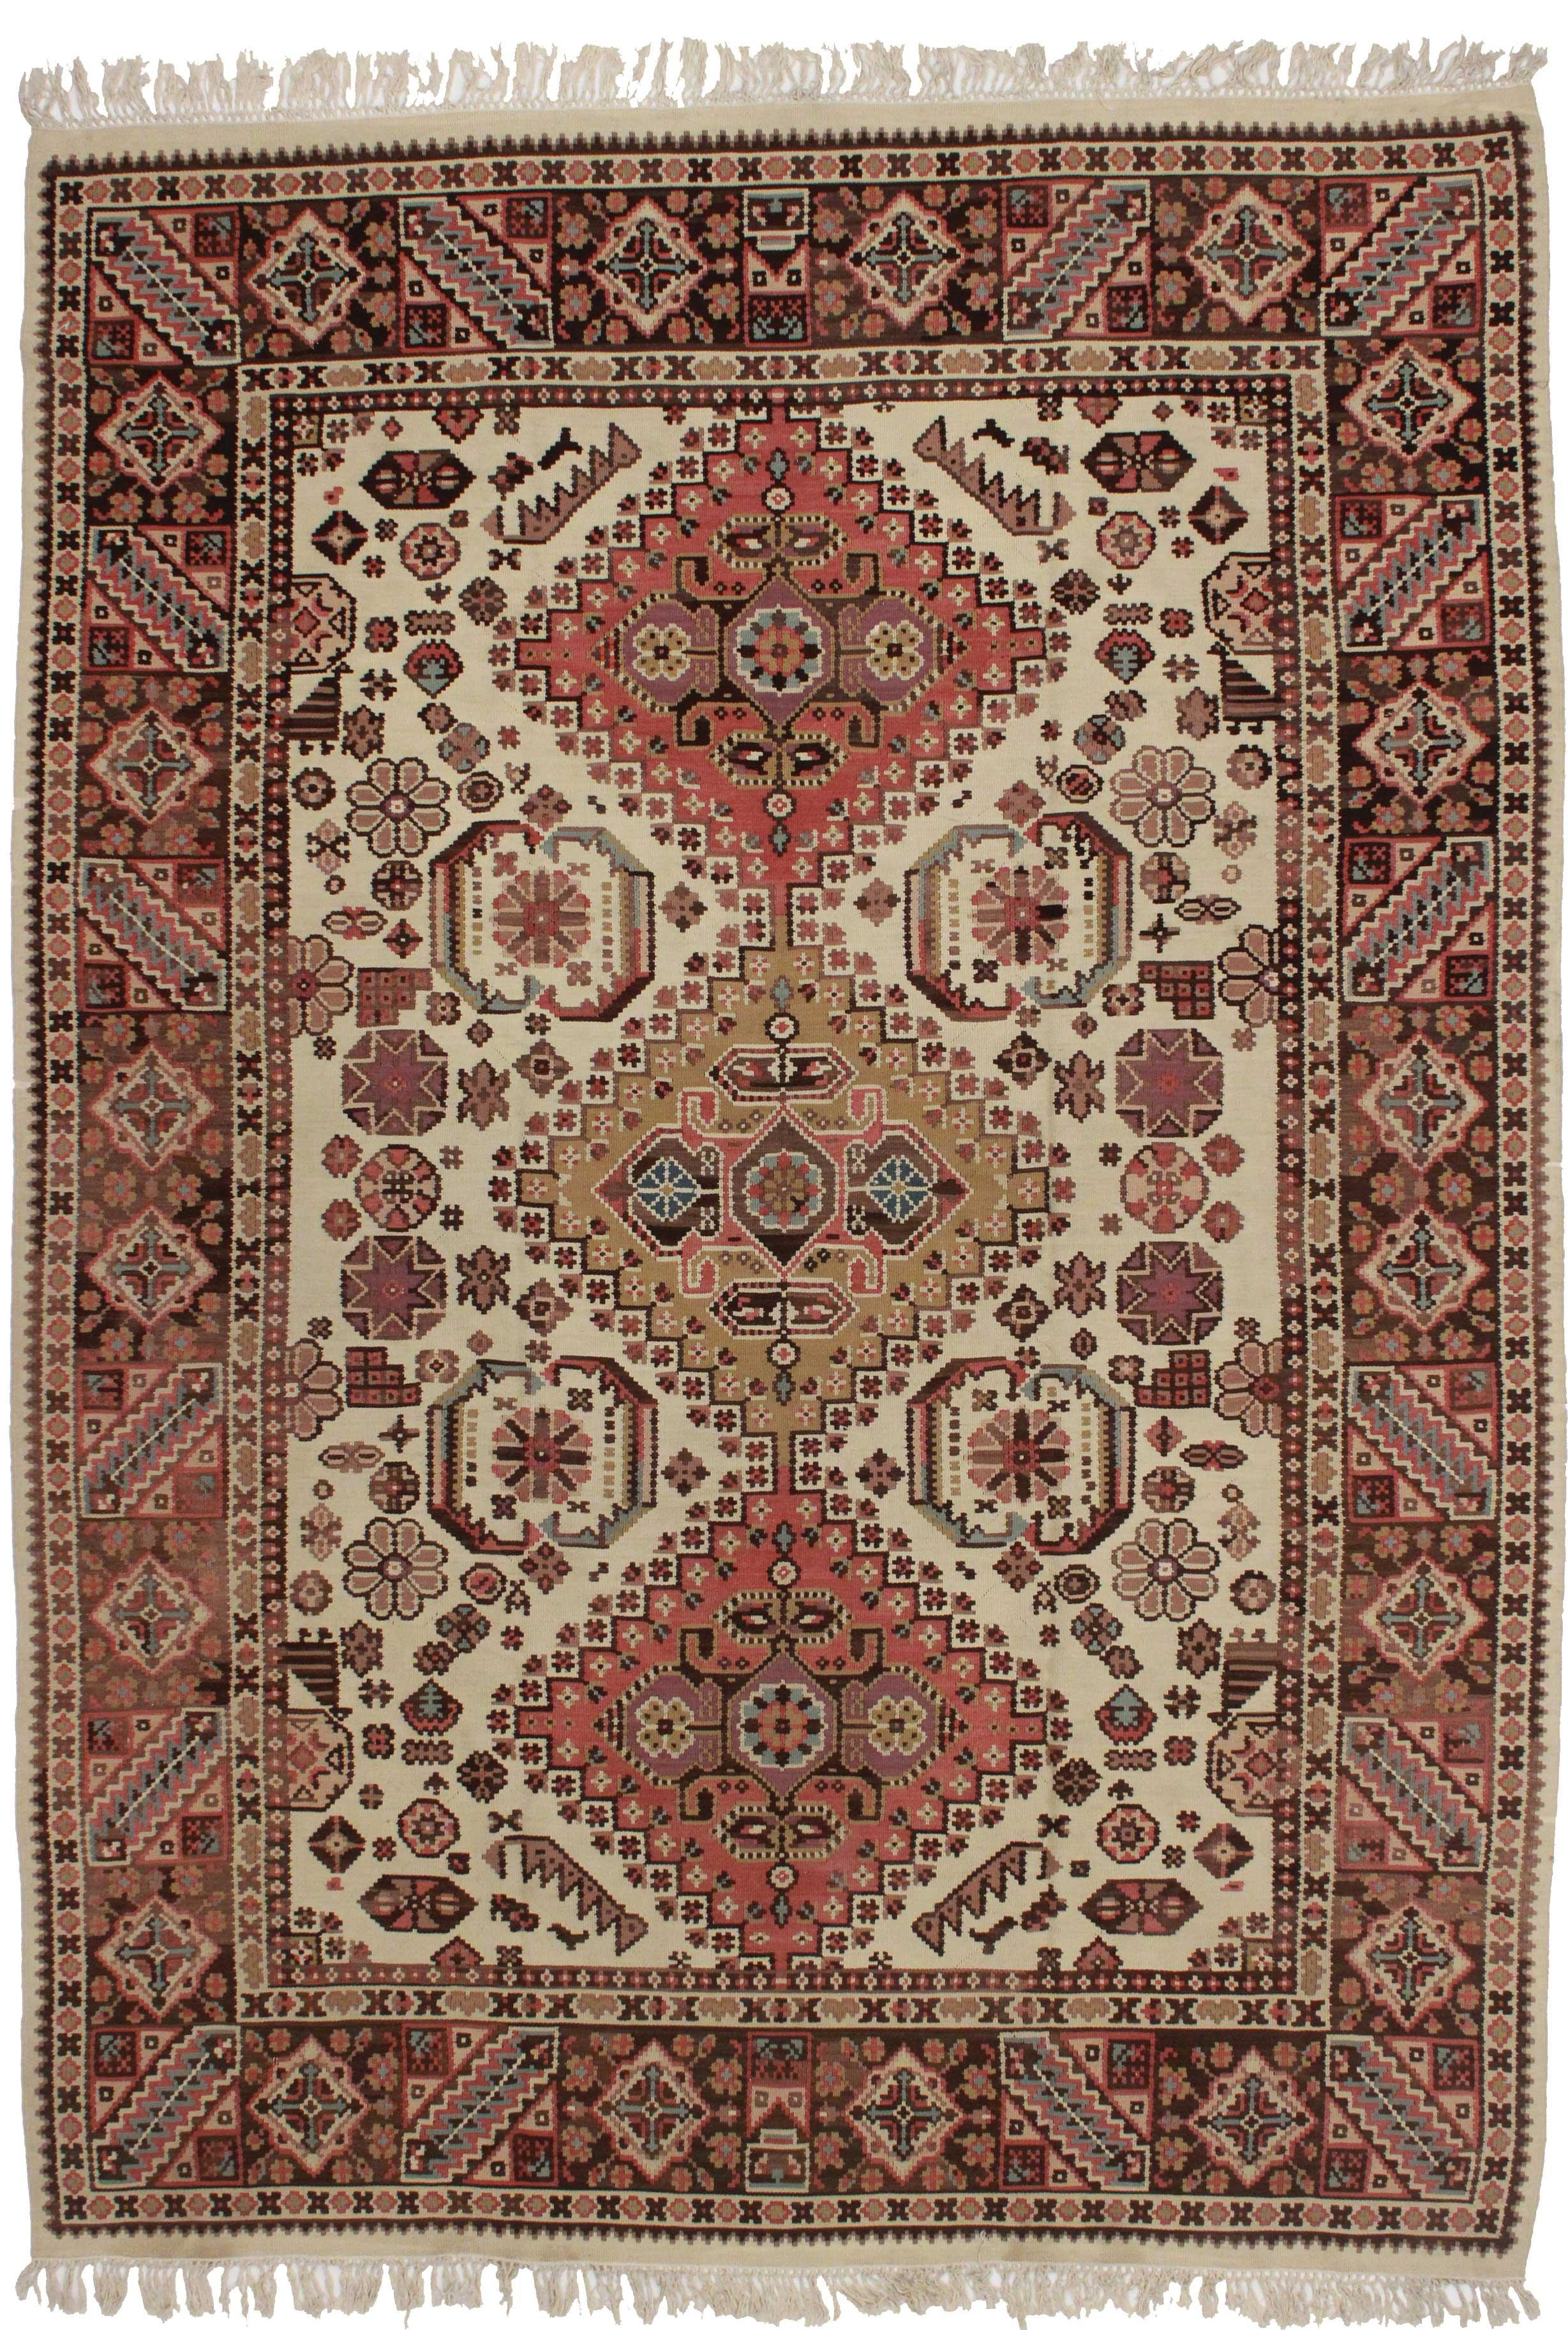 Vintage Turkish Kilim Area Rug 7 1 Quot X 9 8 Quot Chairish